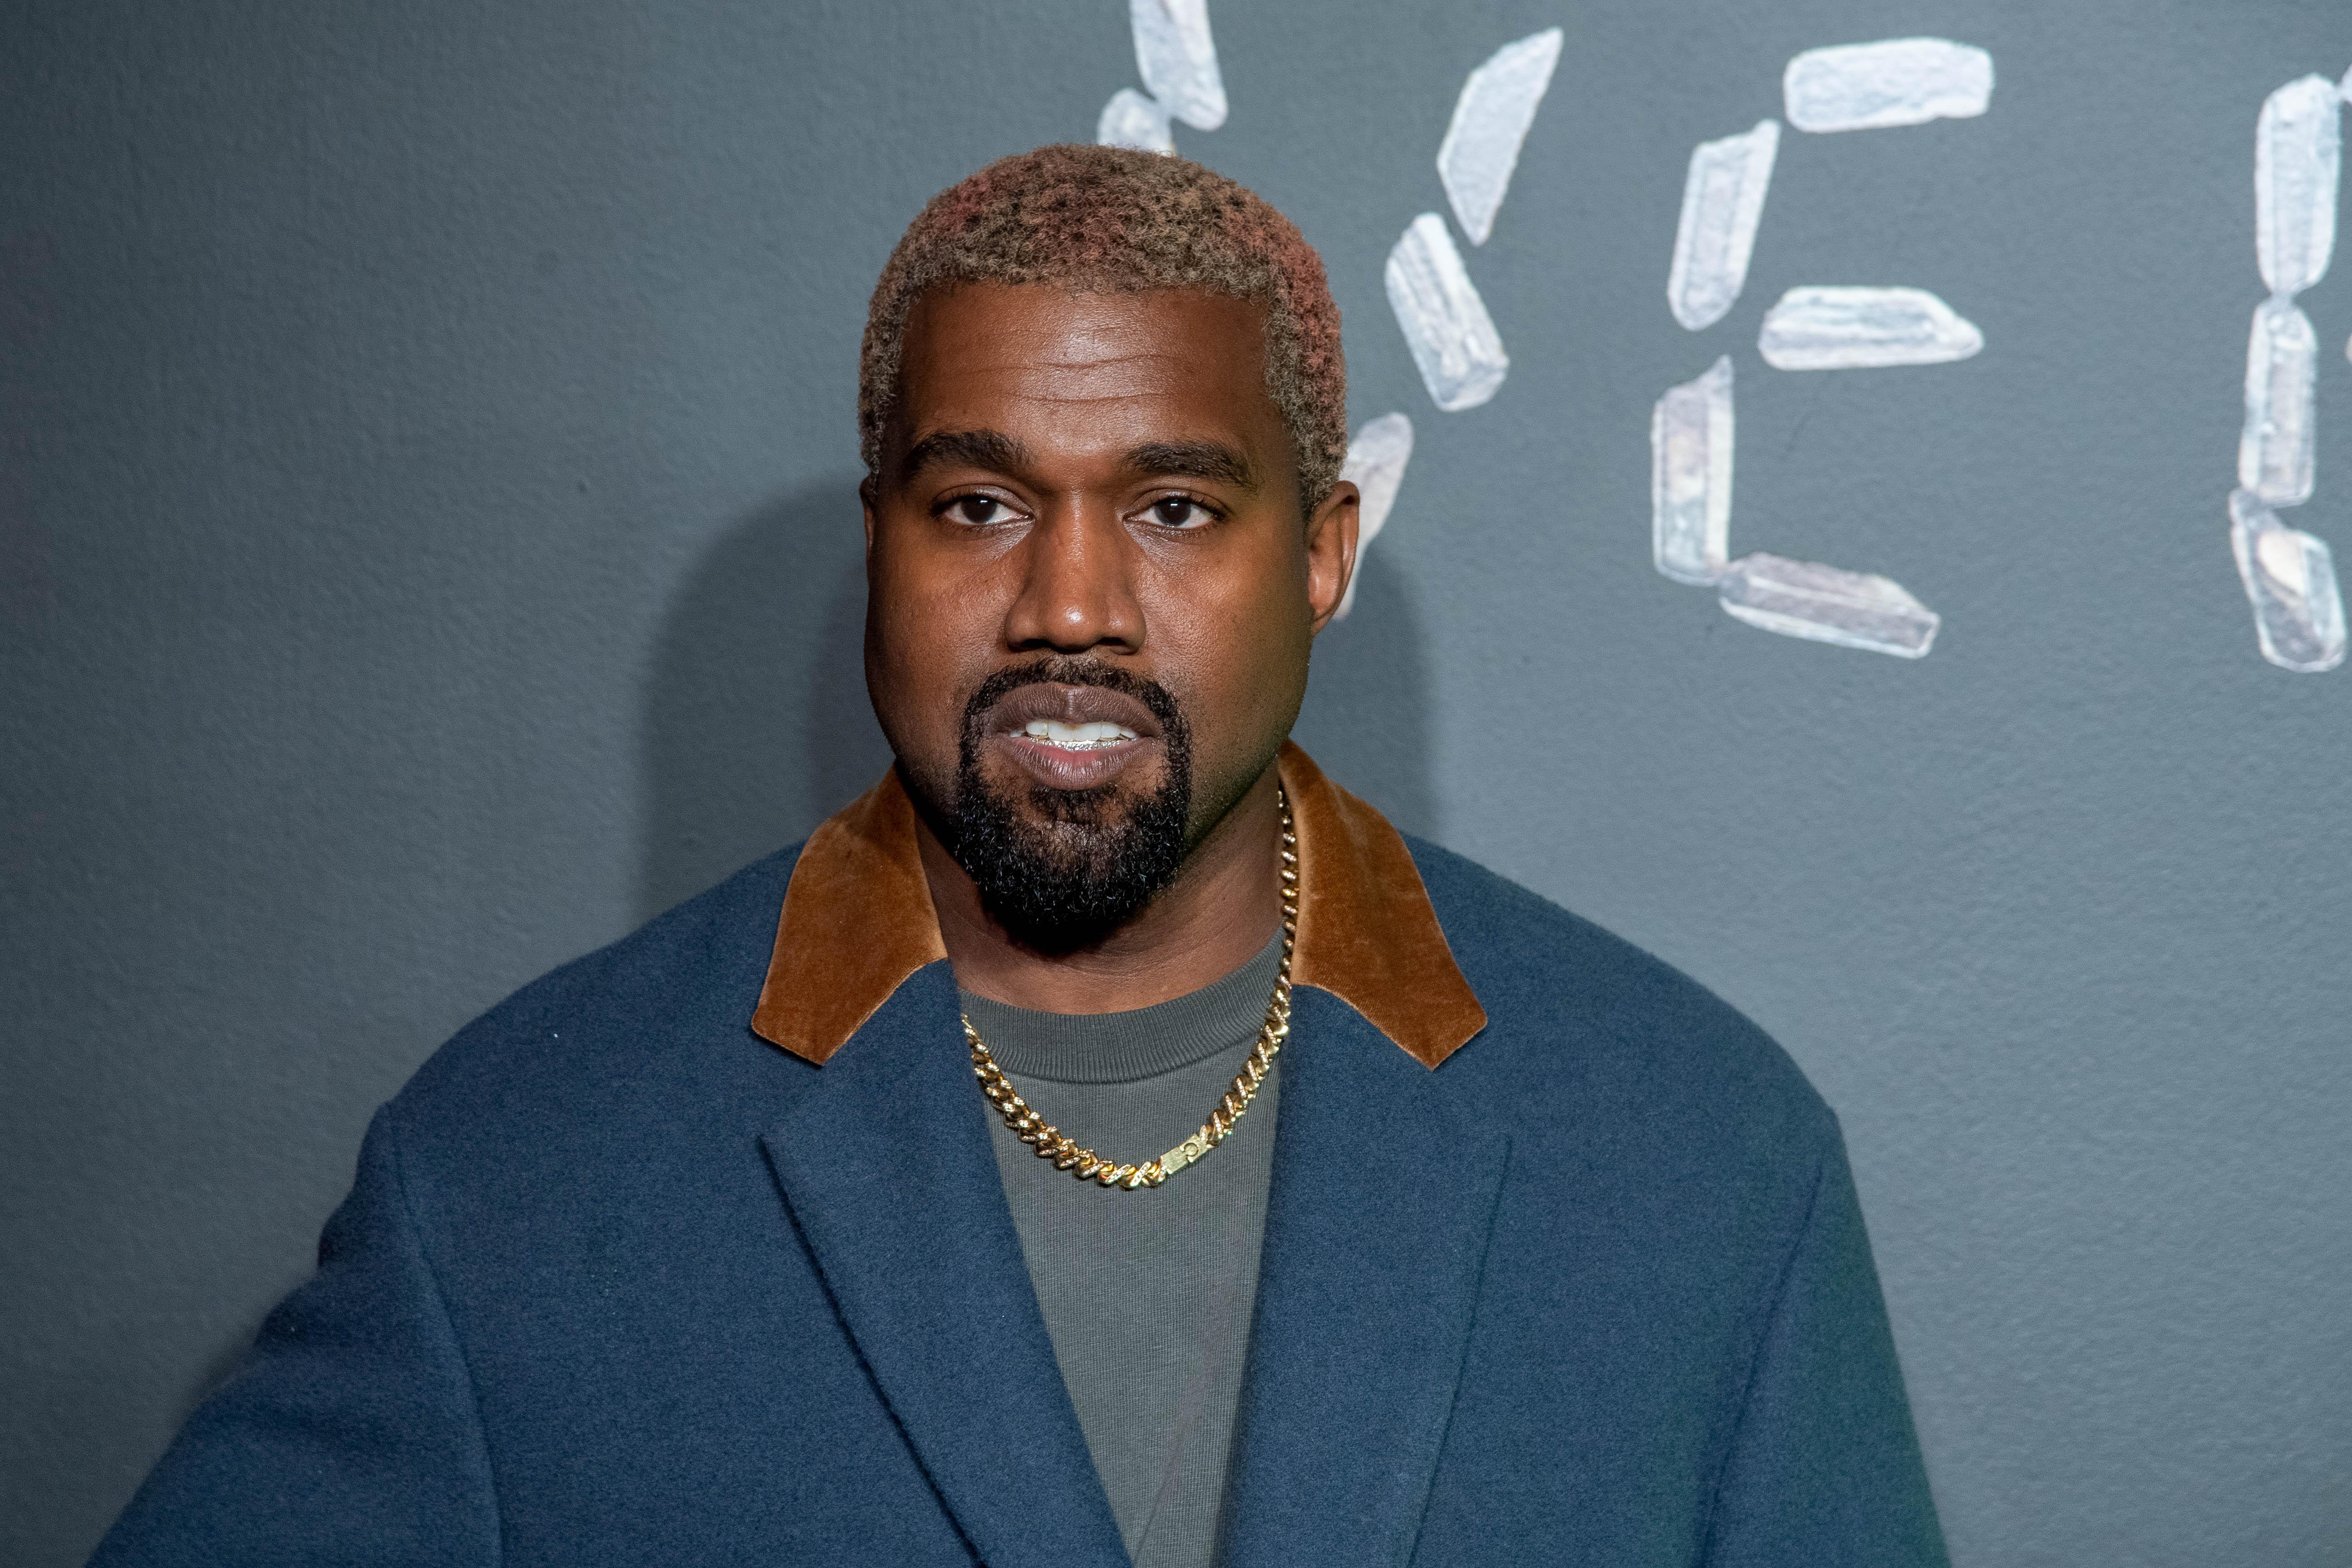 Kanye West Surpasses Drake On Forbes Richest Rappers List